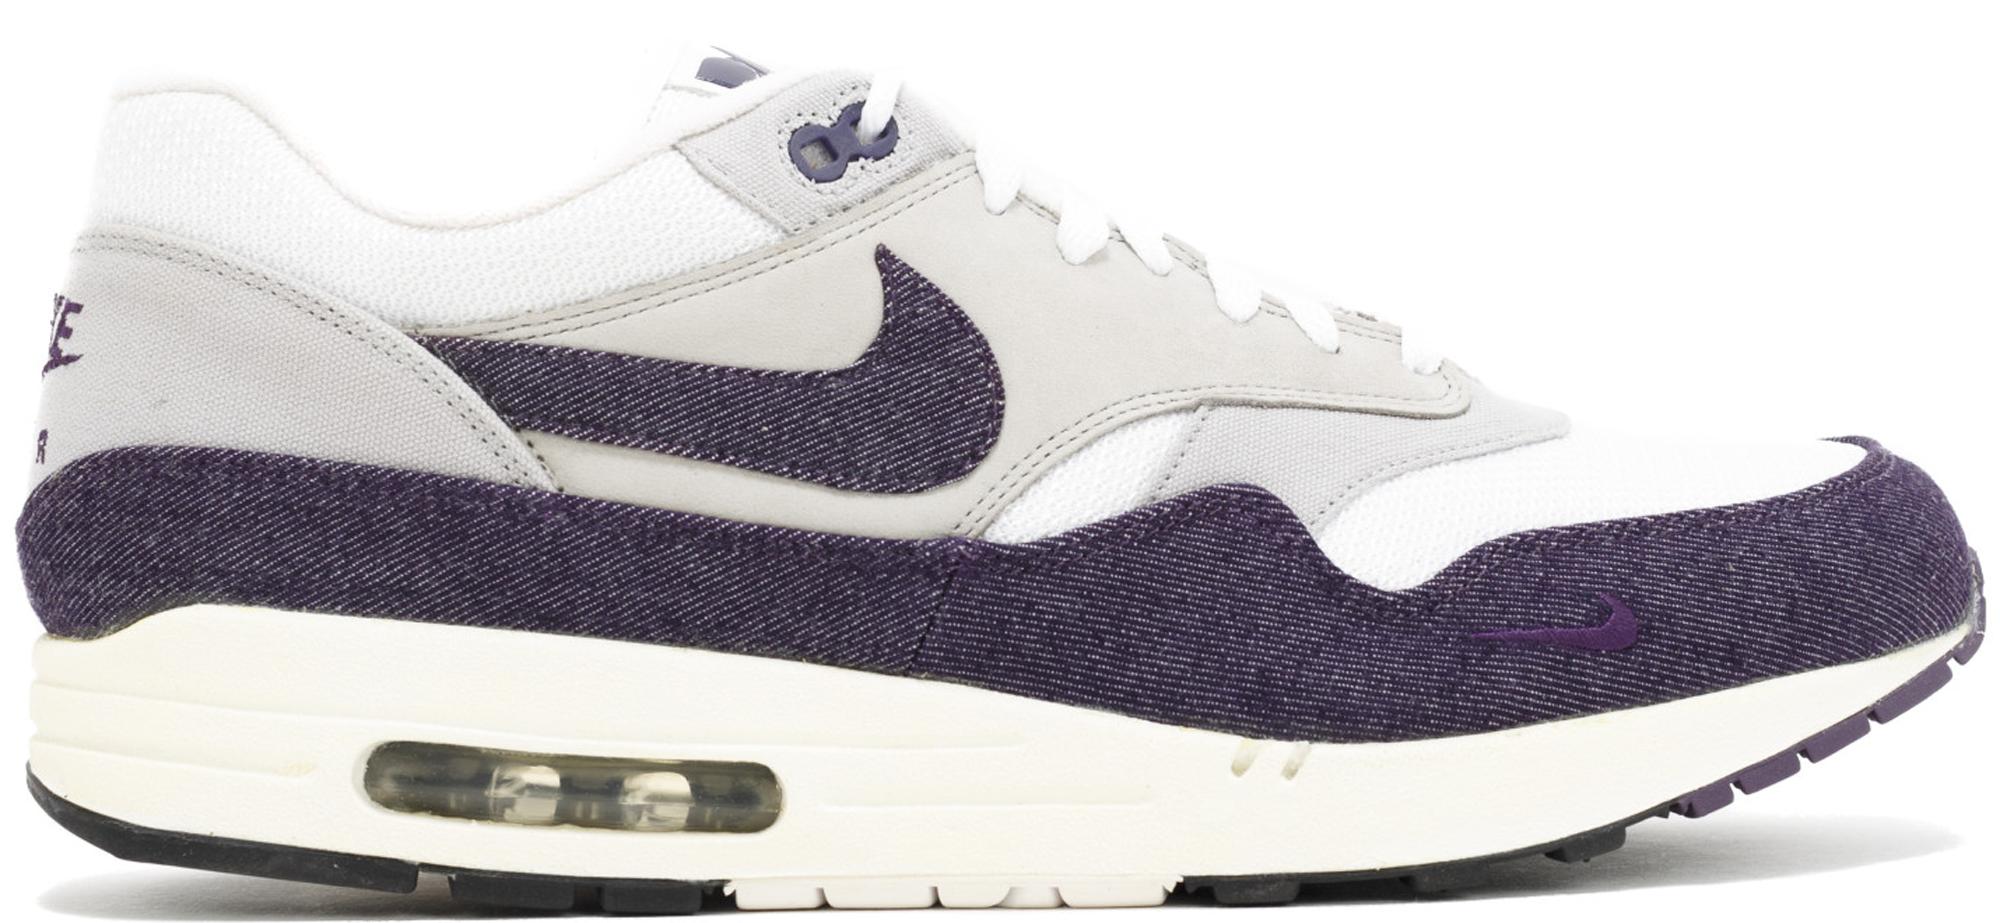 Nike Air Max 1 Patta Purple Denim